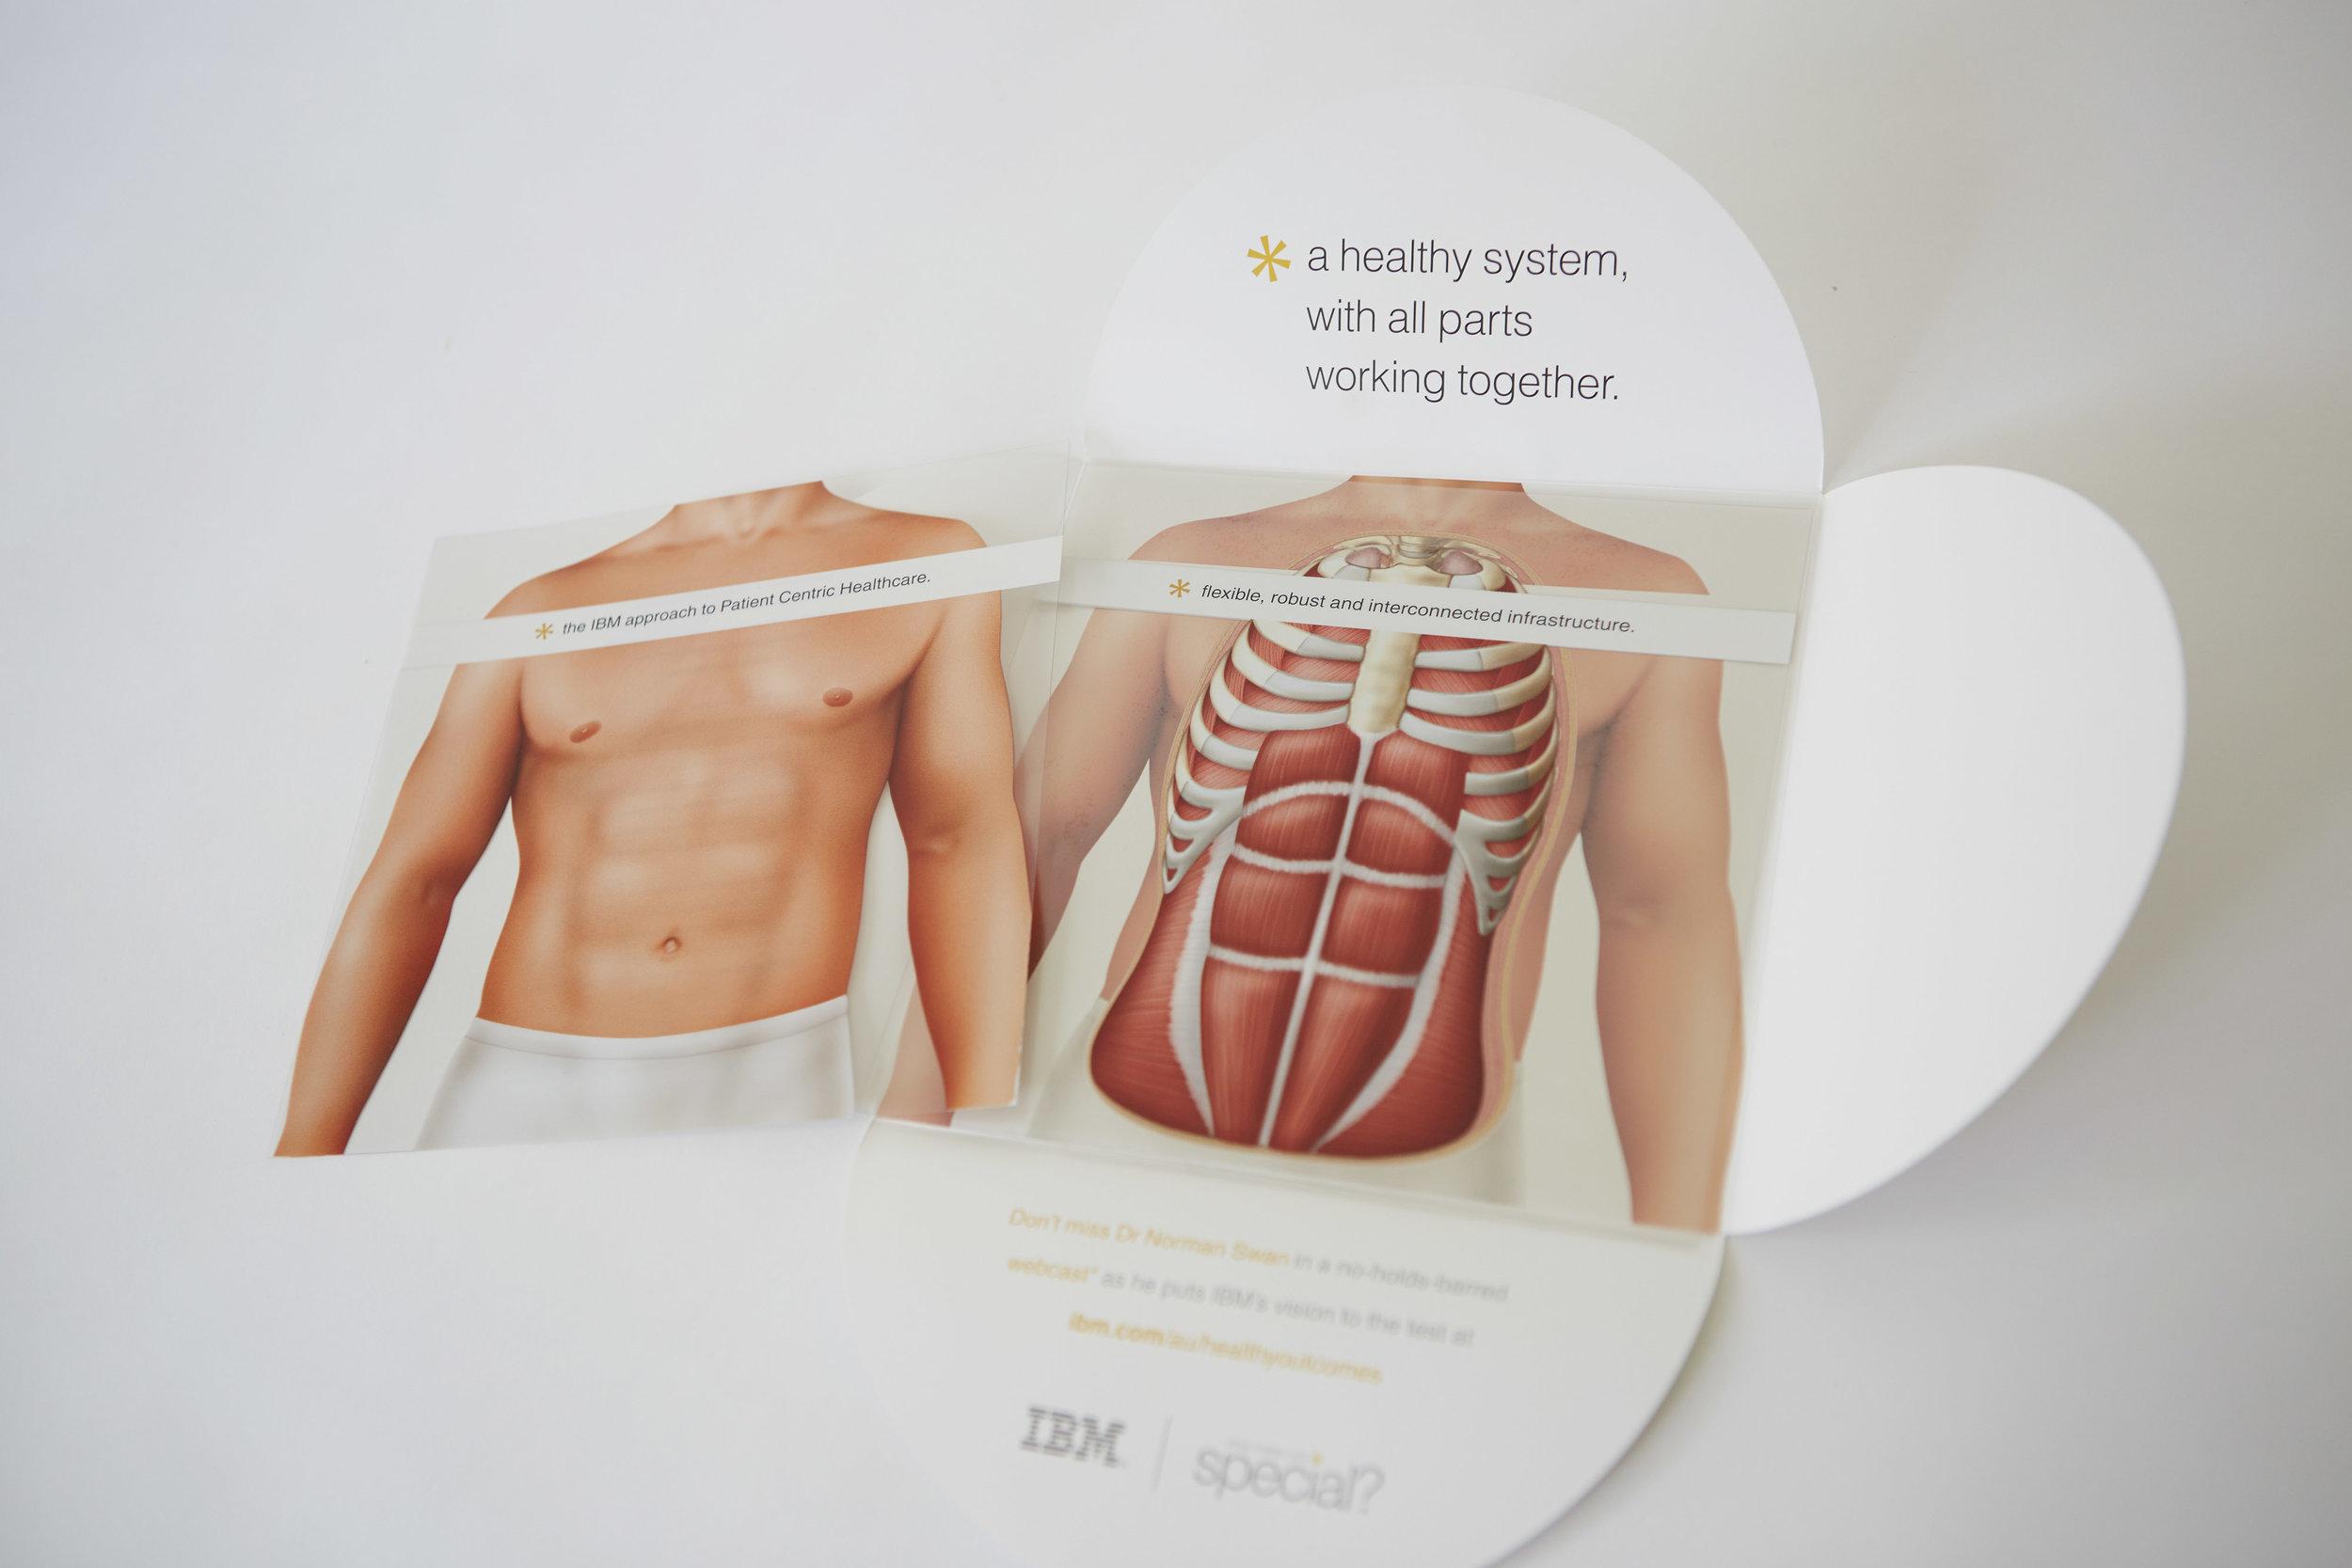 IBM Health